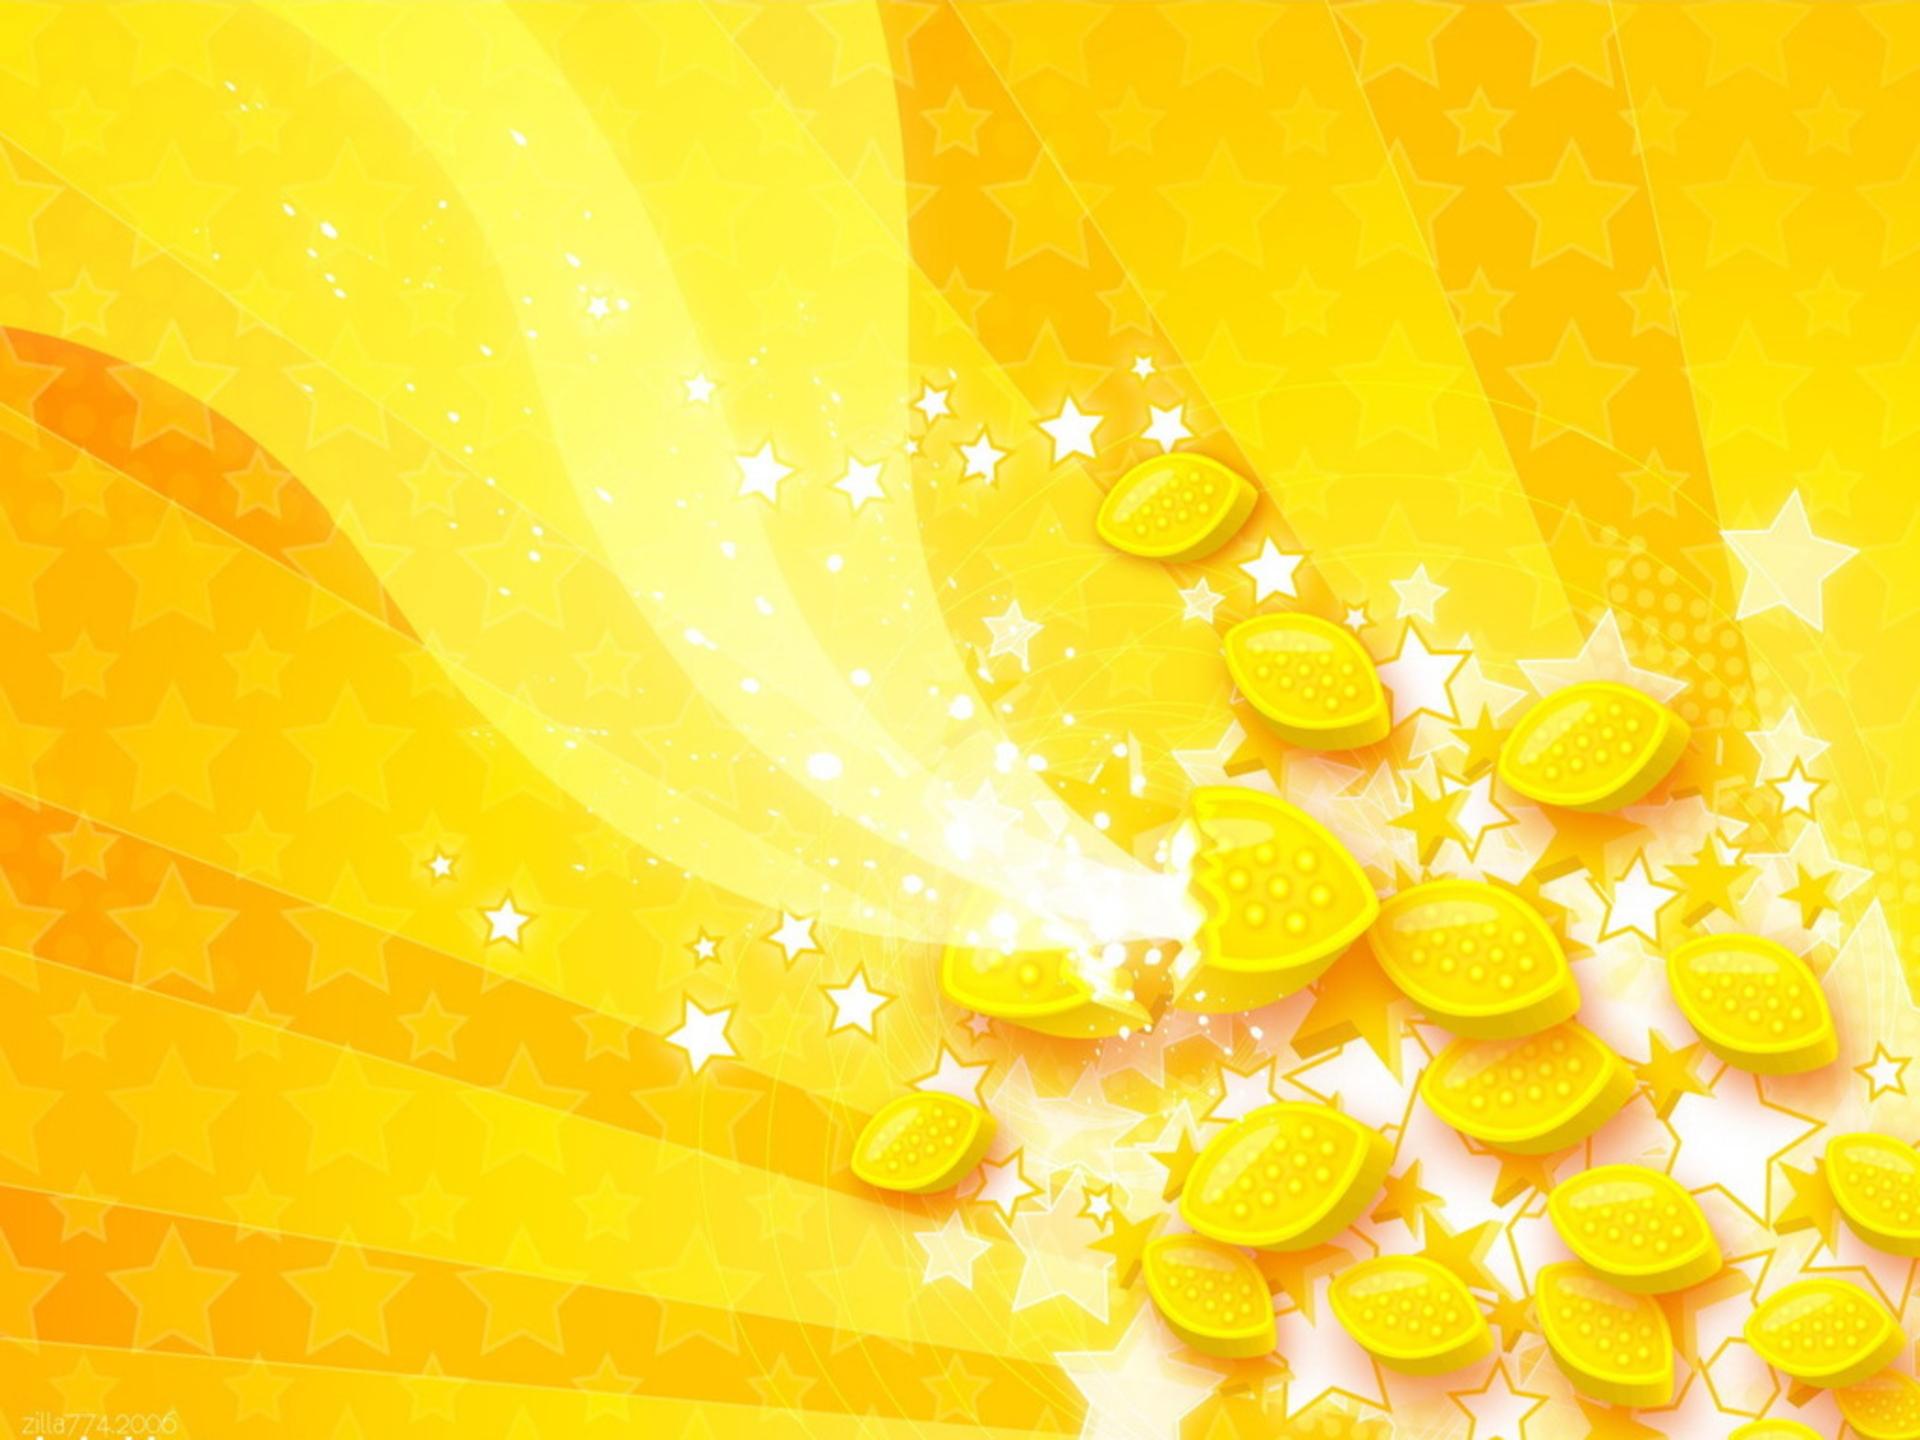 Yellow Backgrounds Wallpaper